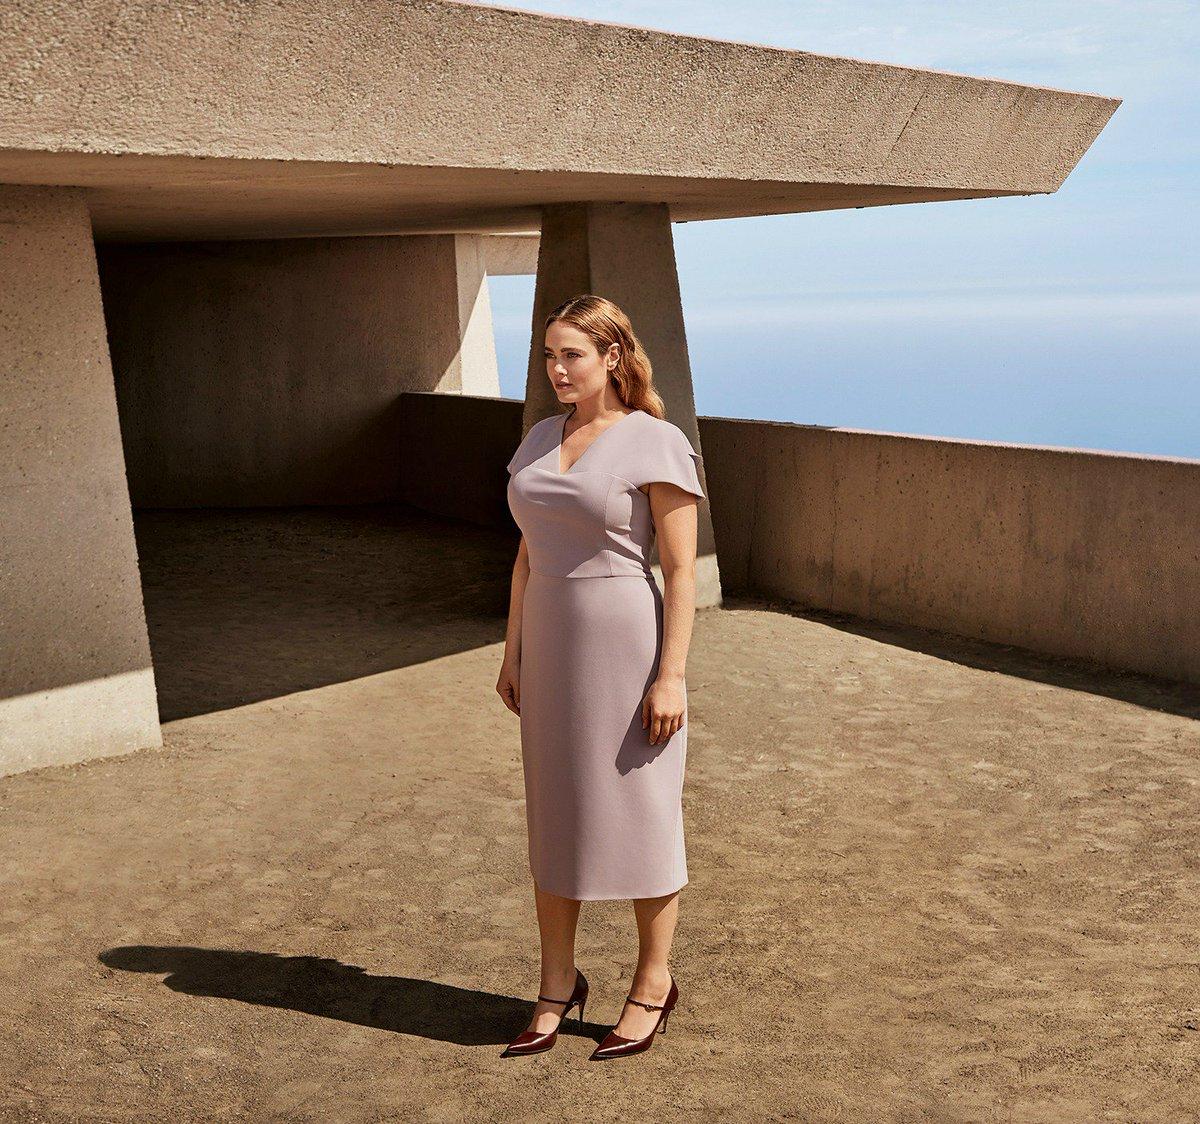 Redefining elegance in @CSiriano bit.ly/2yRiQUR #11honore #luxurywithoutlimits #fashion #plussizefashion